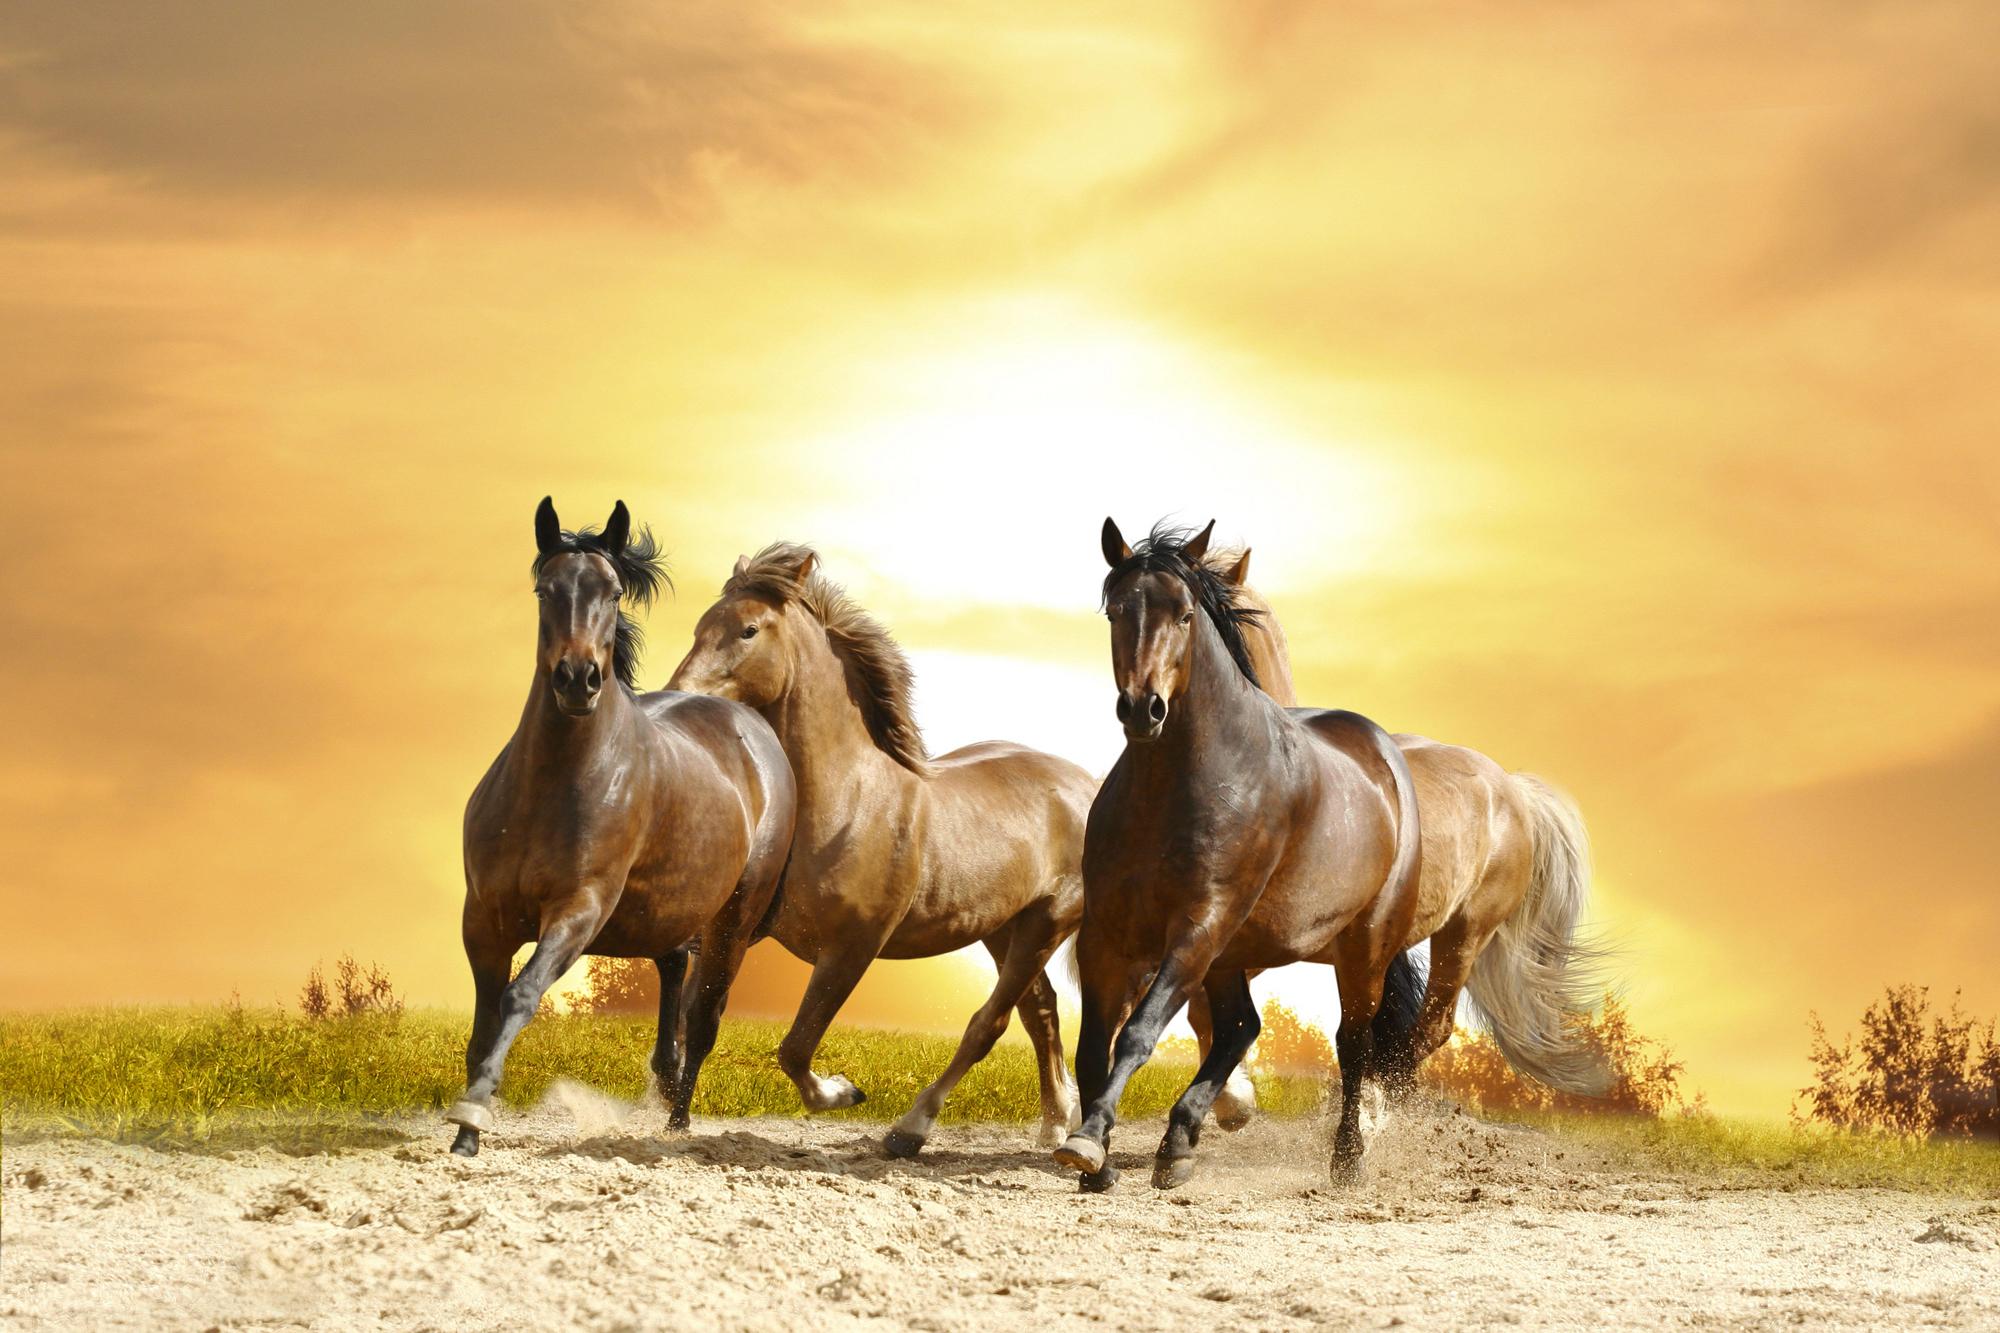 Caballos Fondos De Pantalla, Horses Wallpapers Hd